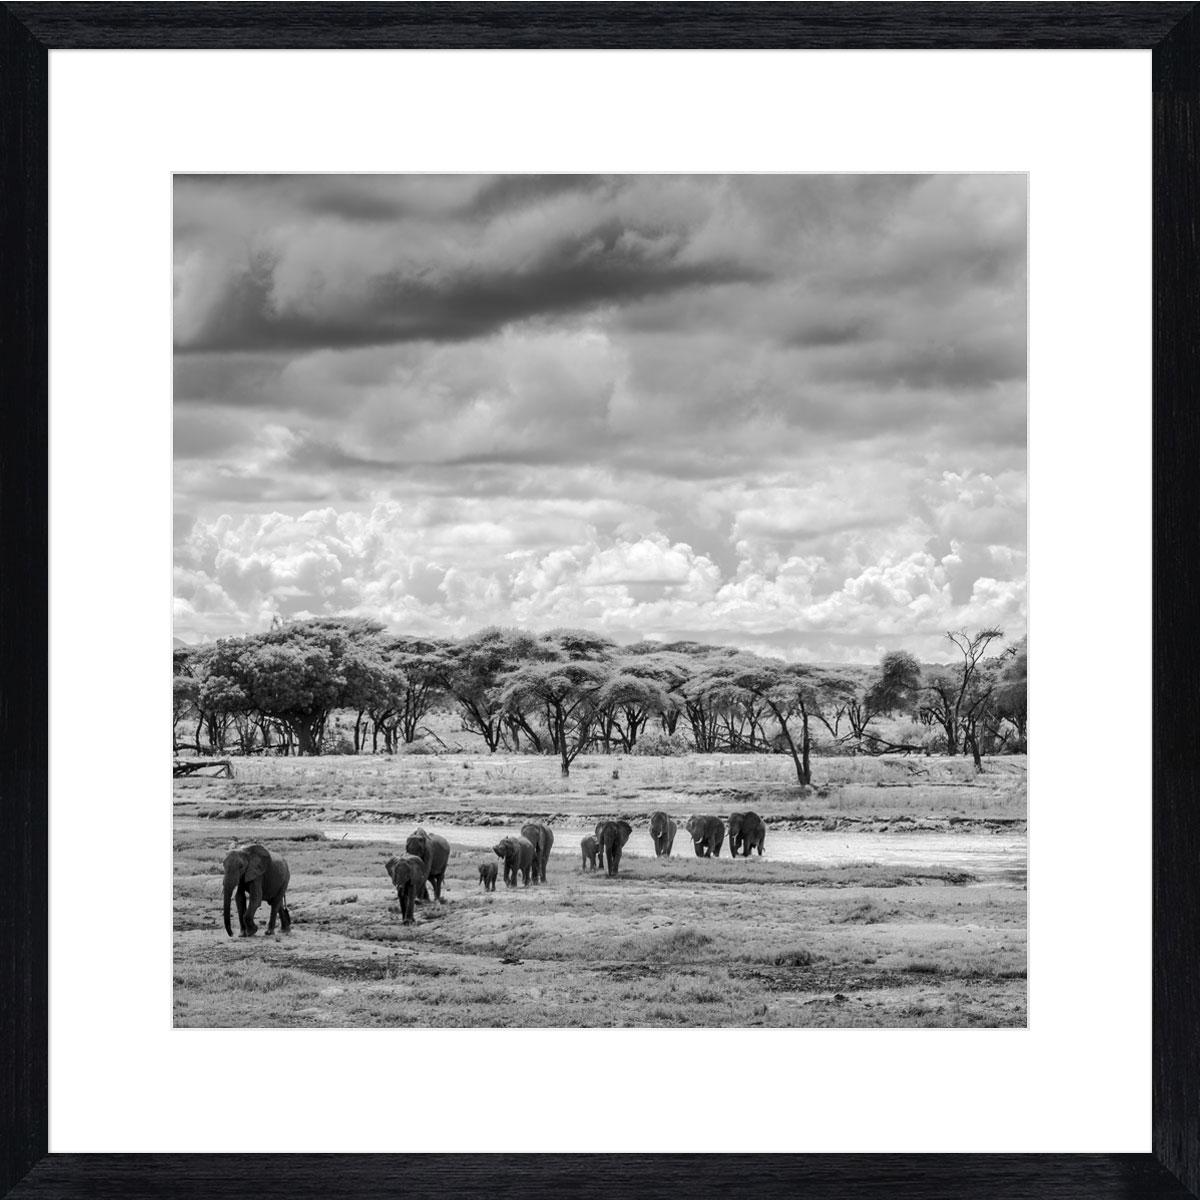 elephants-ruaha-photographic-print-black